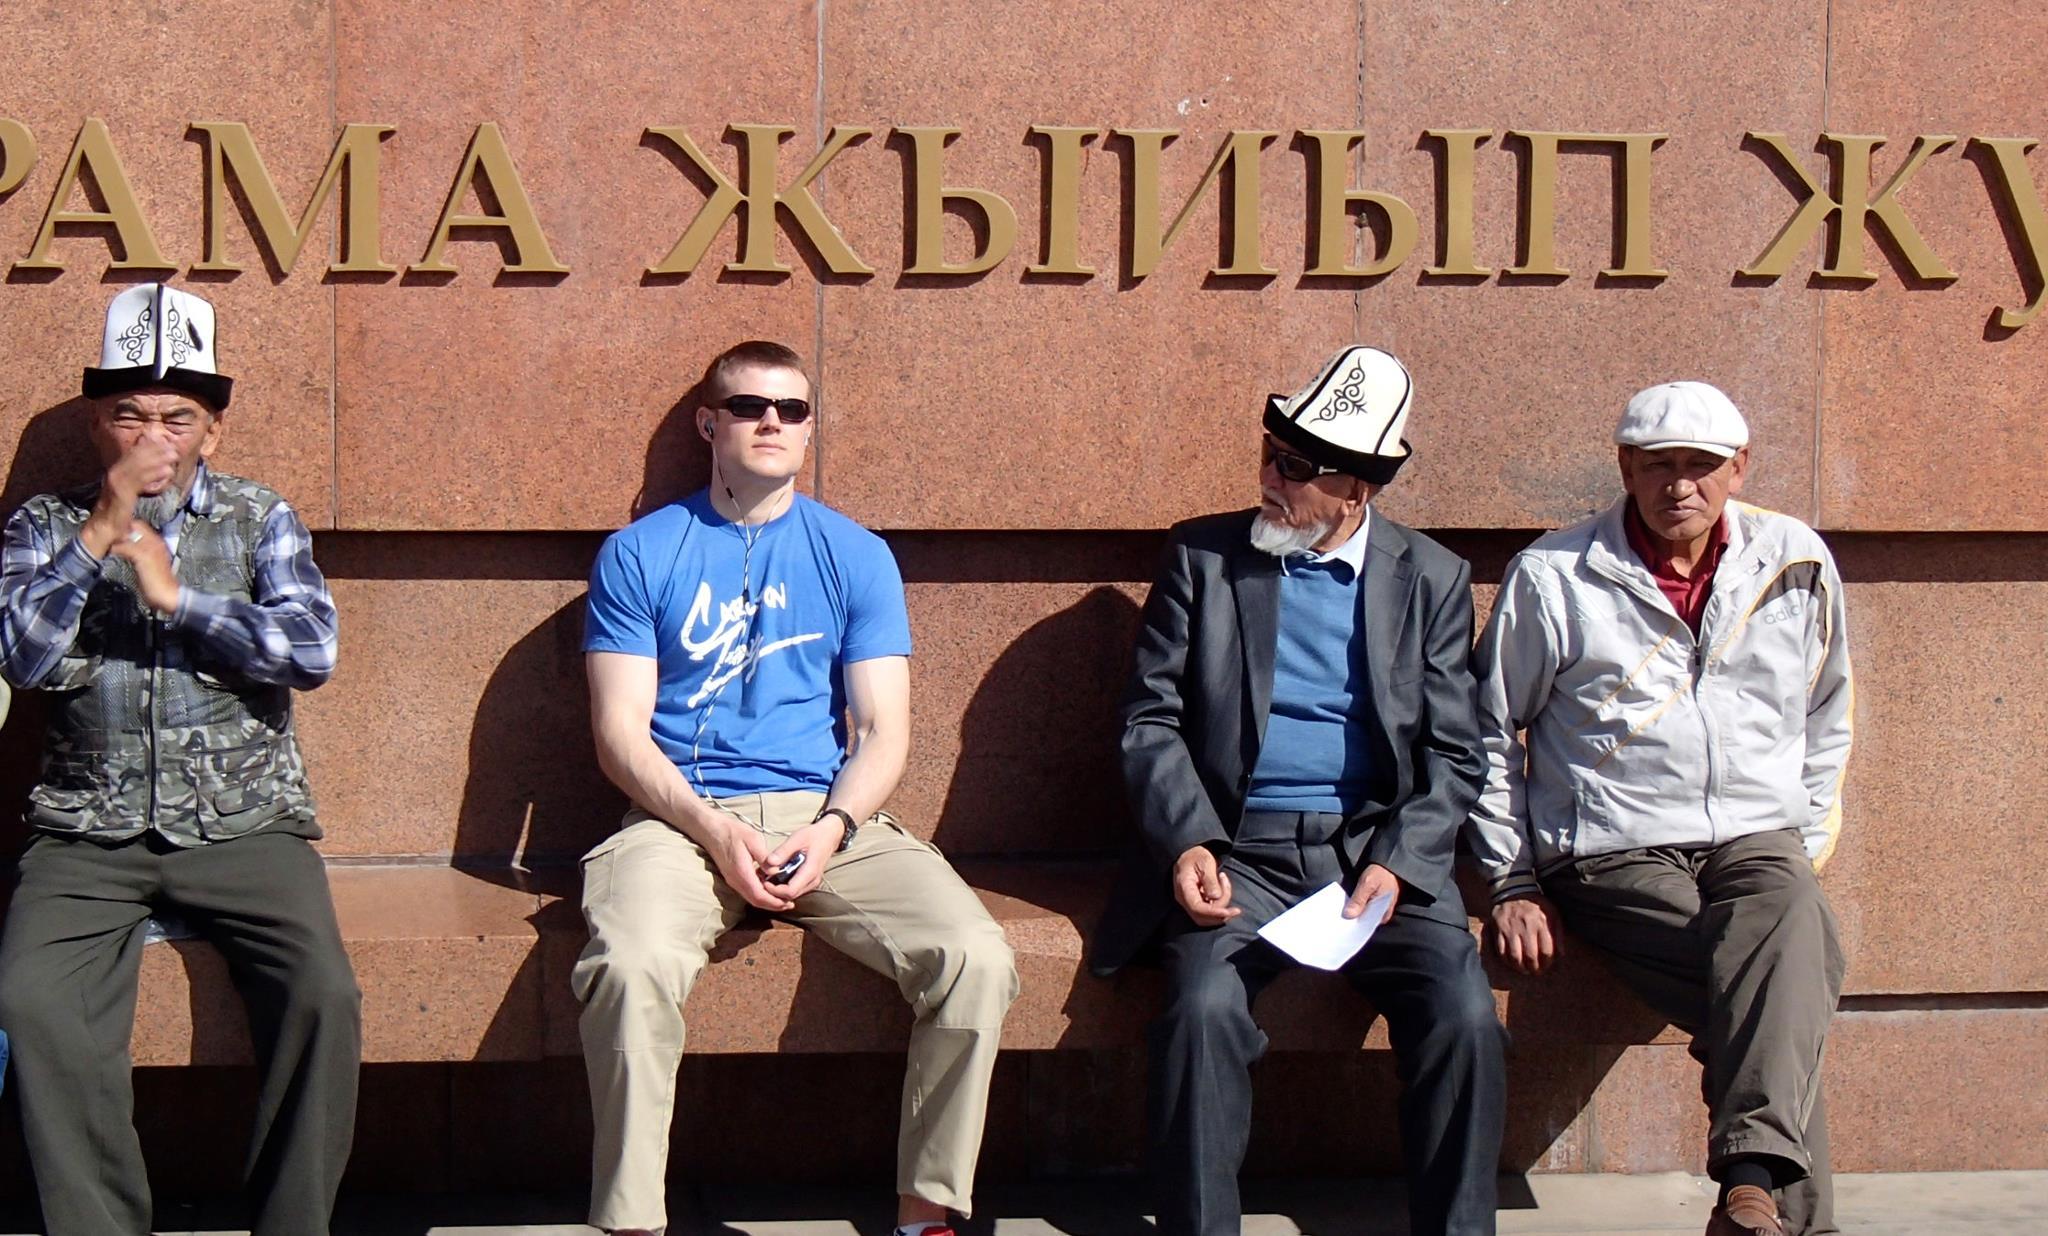 Capt. Henke, Bishkek Kyrgyzstan